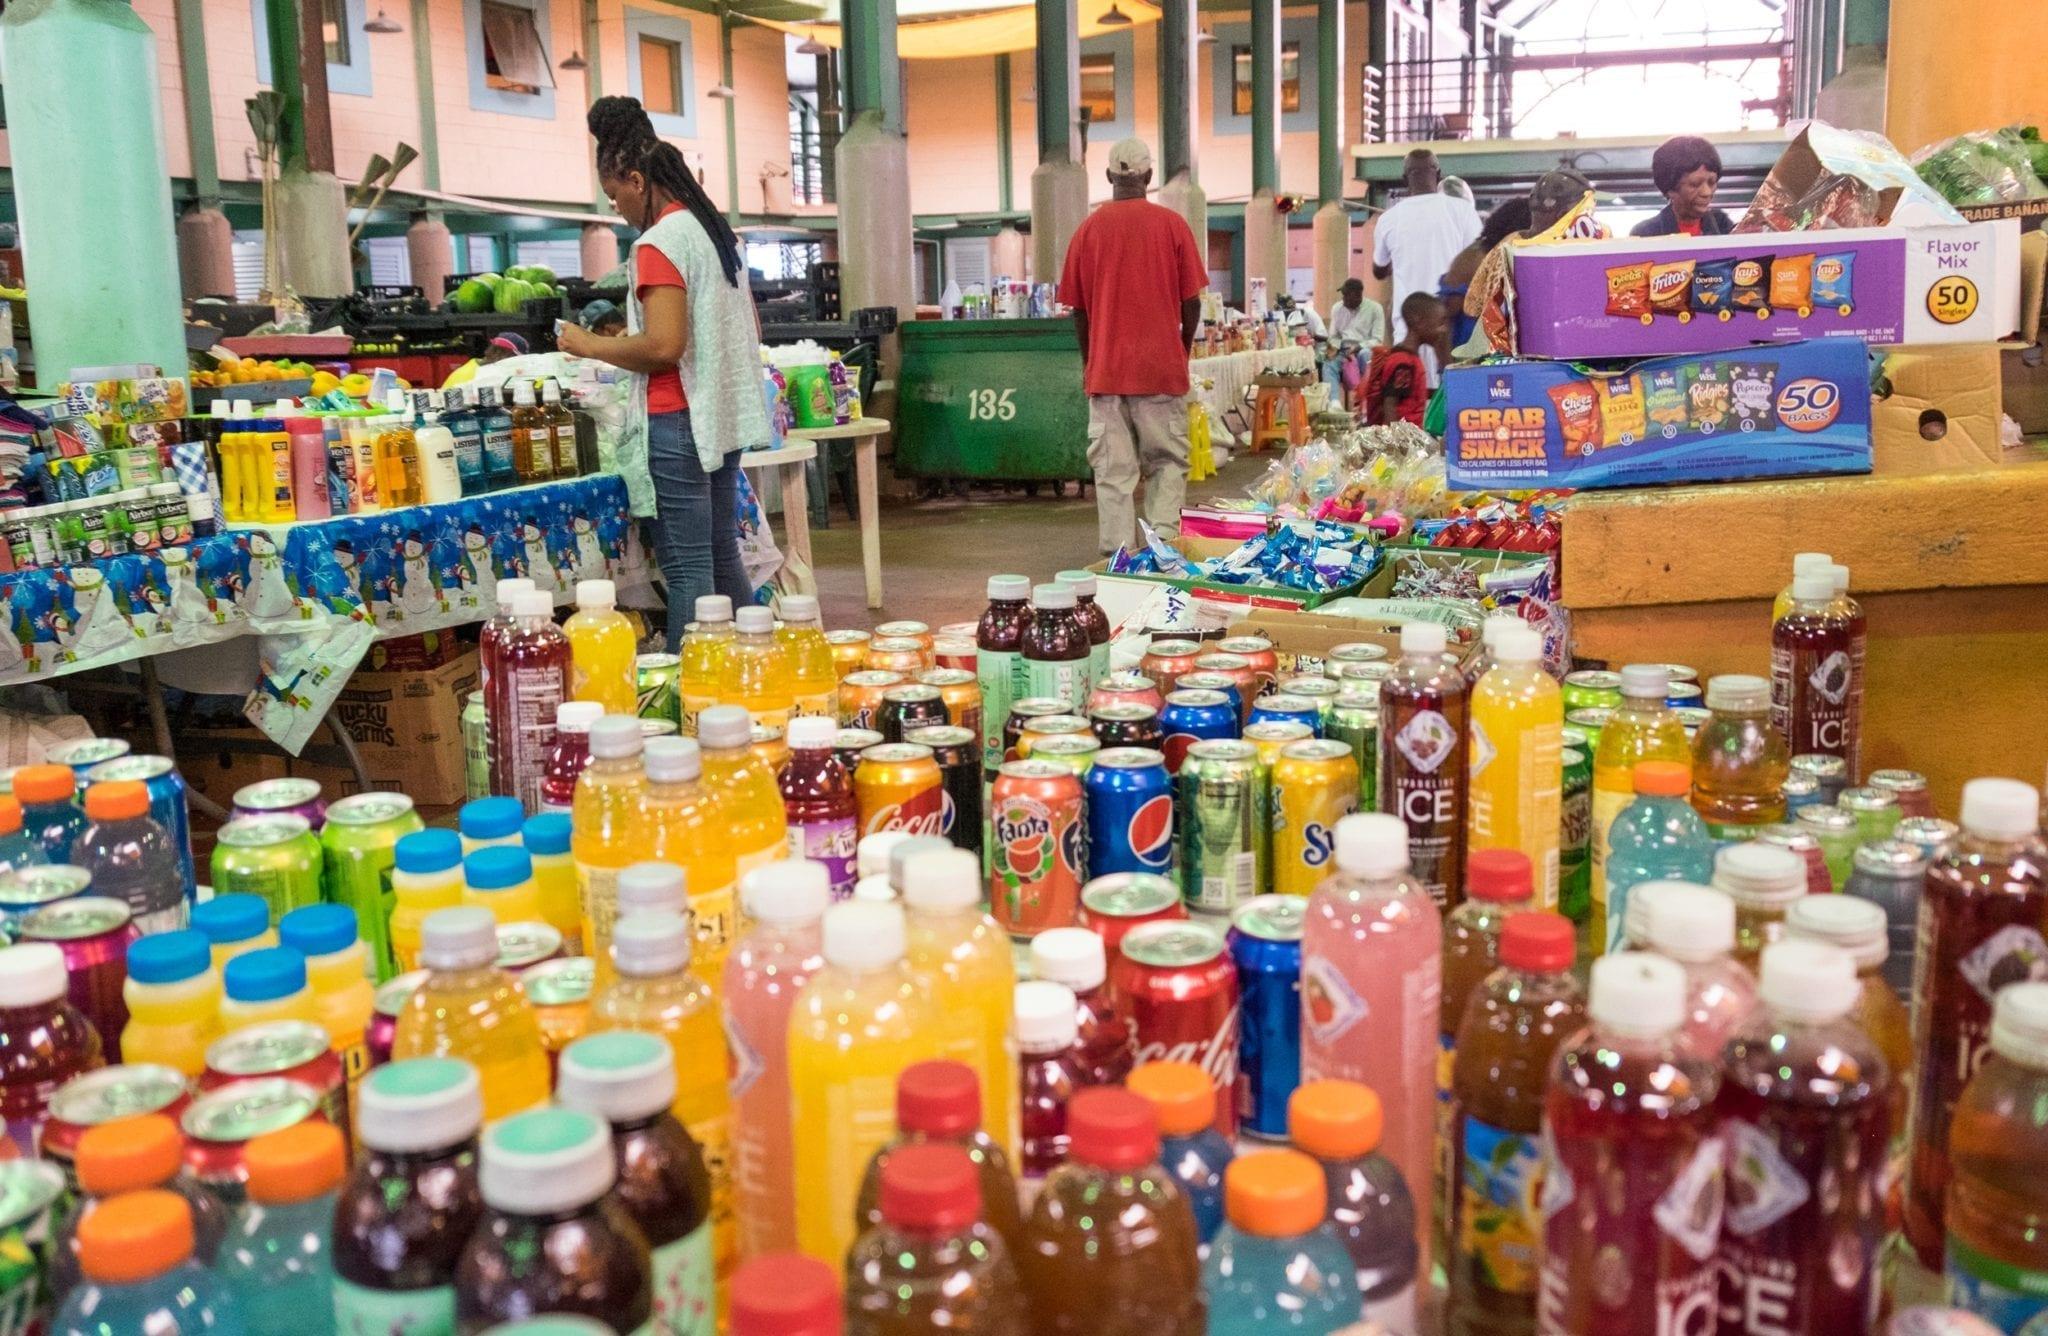 Dozens of bottled drinks on a table in a market in St. John's, Antigua